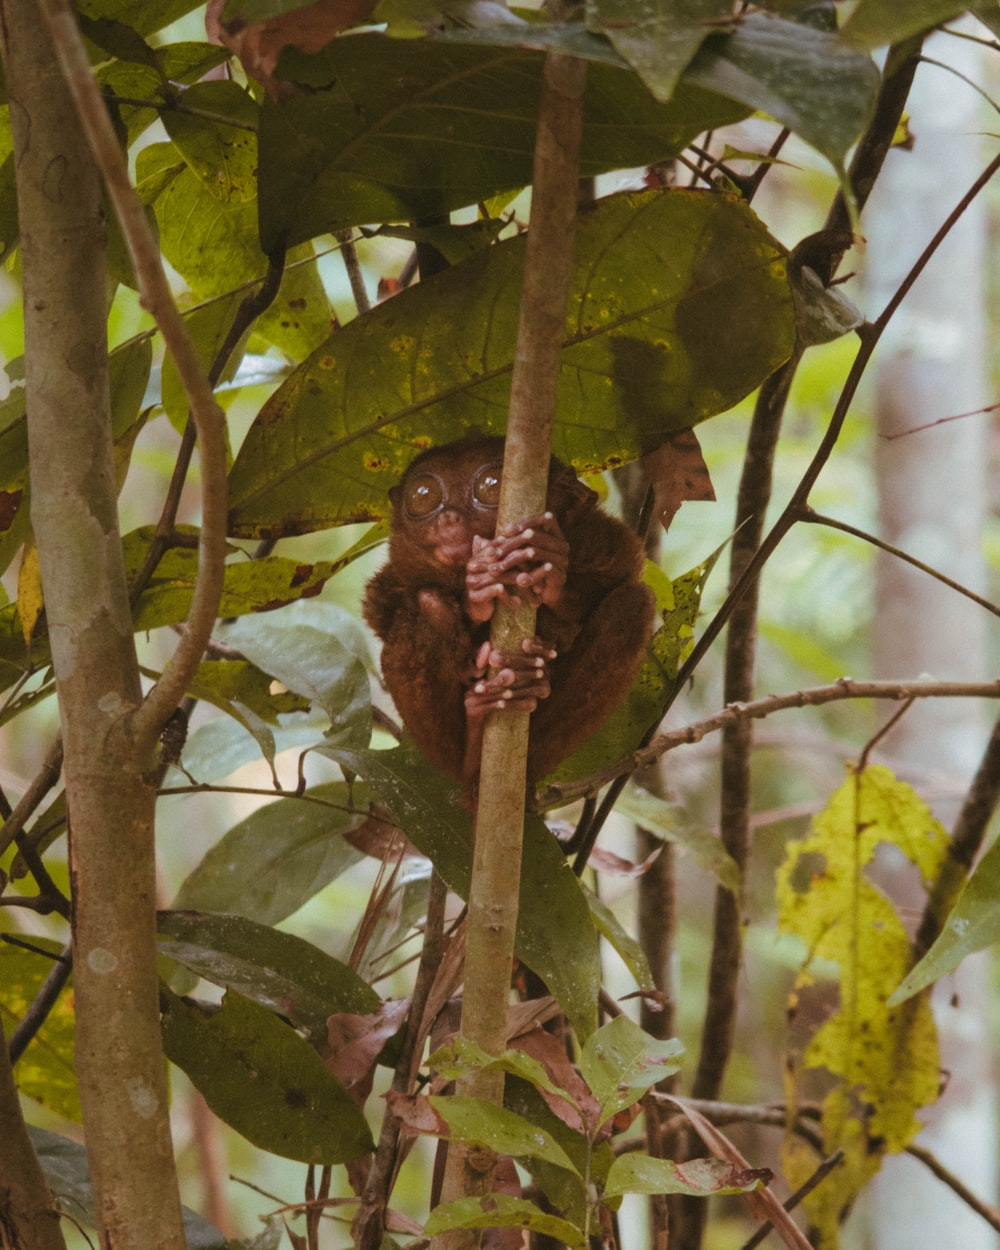 brown monkey on green leaf during daytime